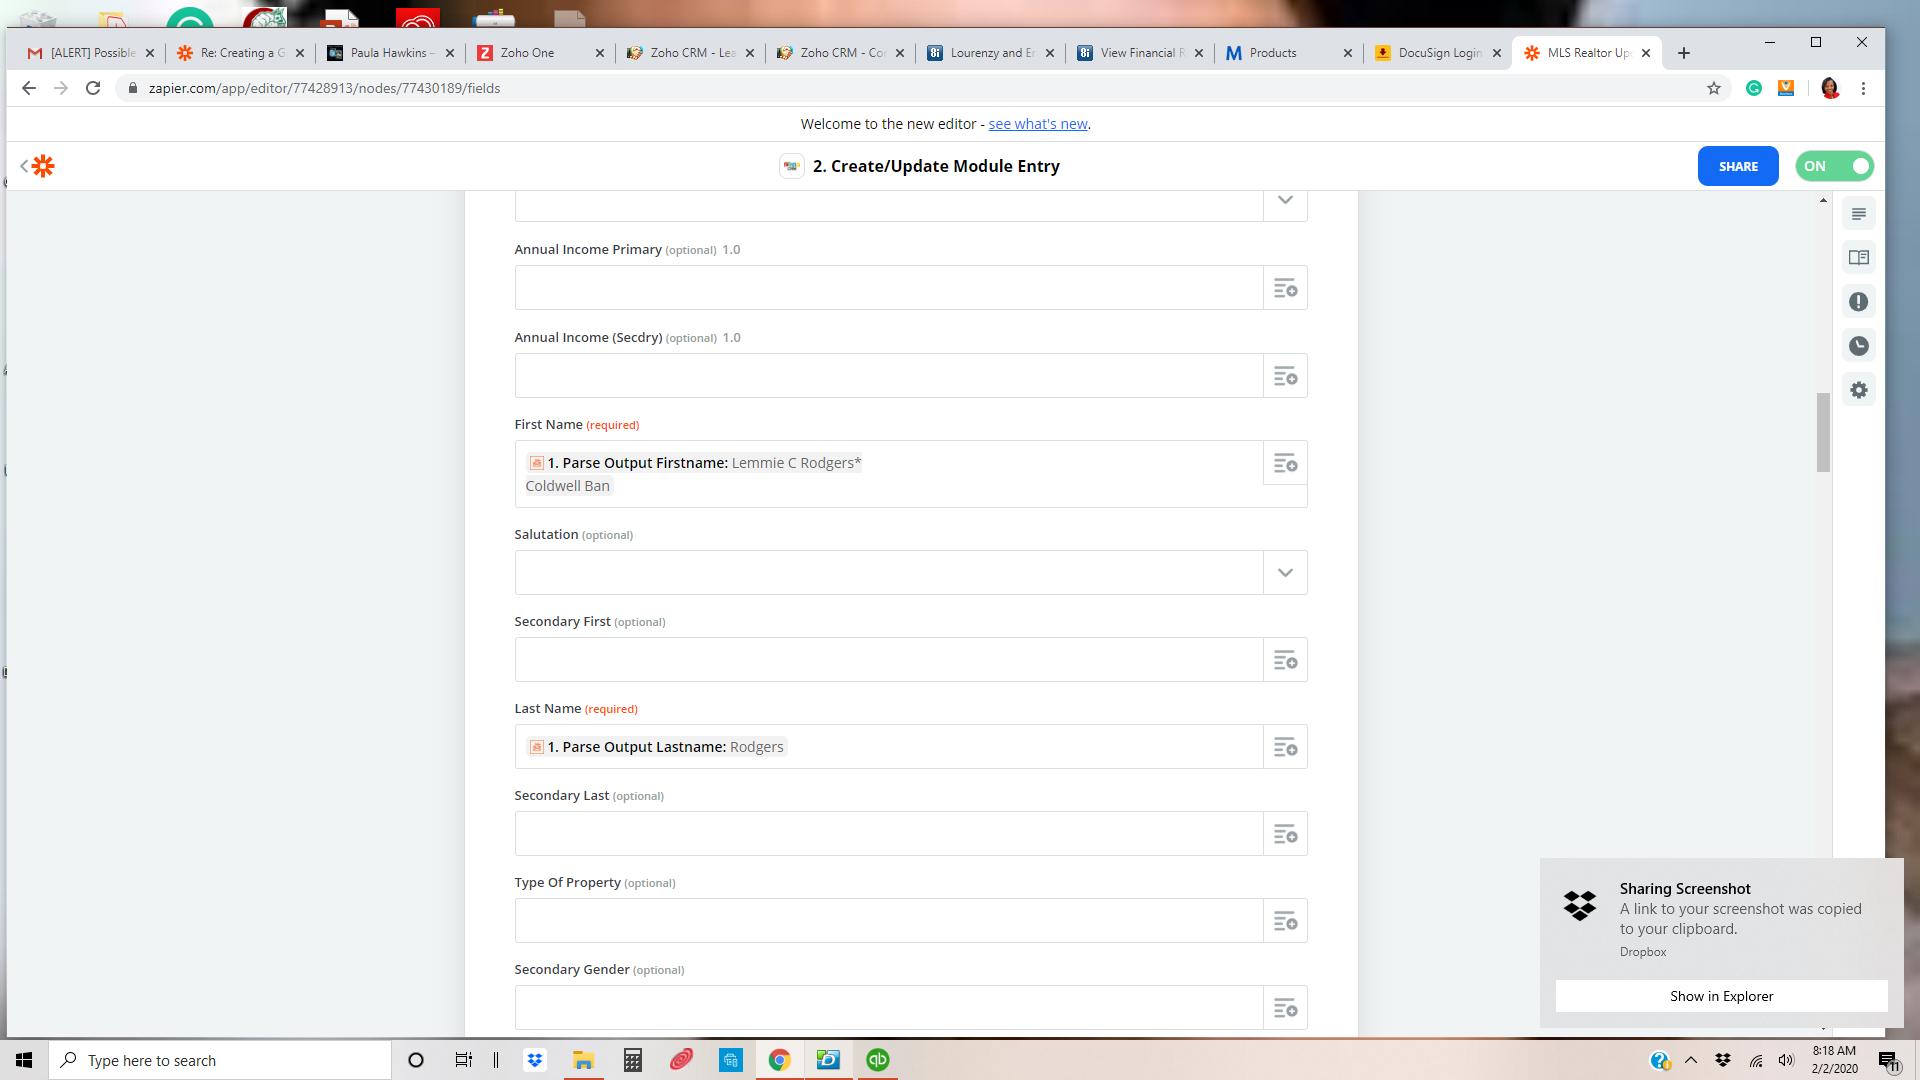 Screenshot 2020-02-02 08.18.13.png